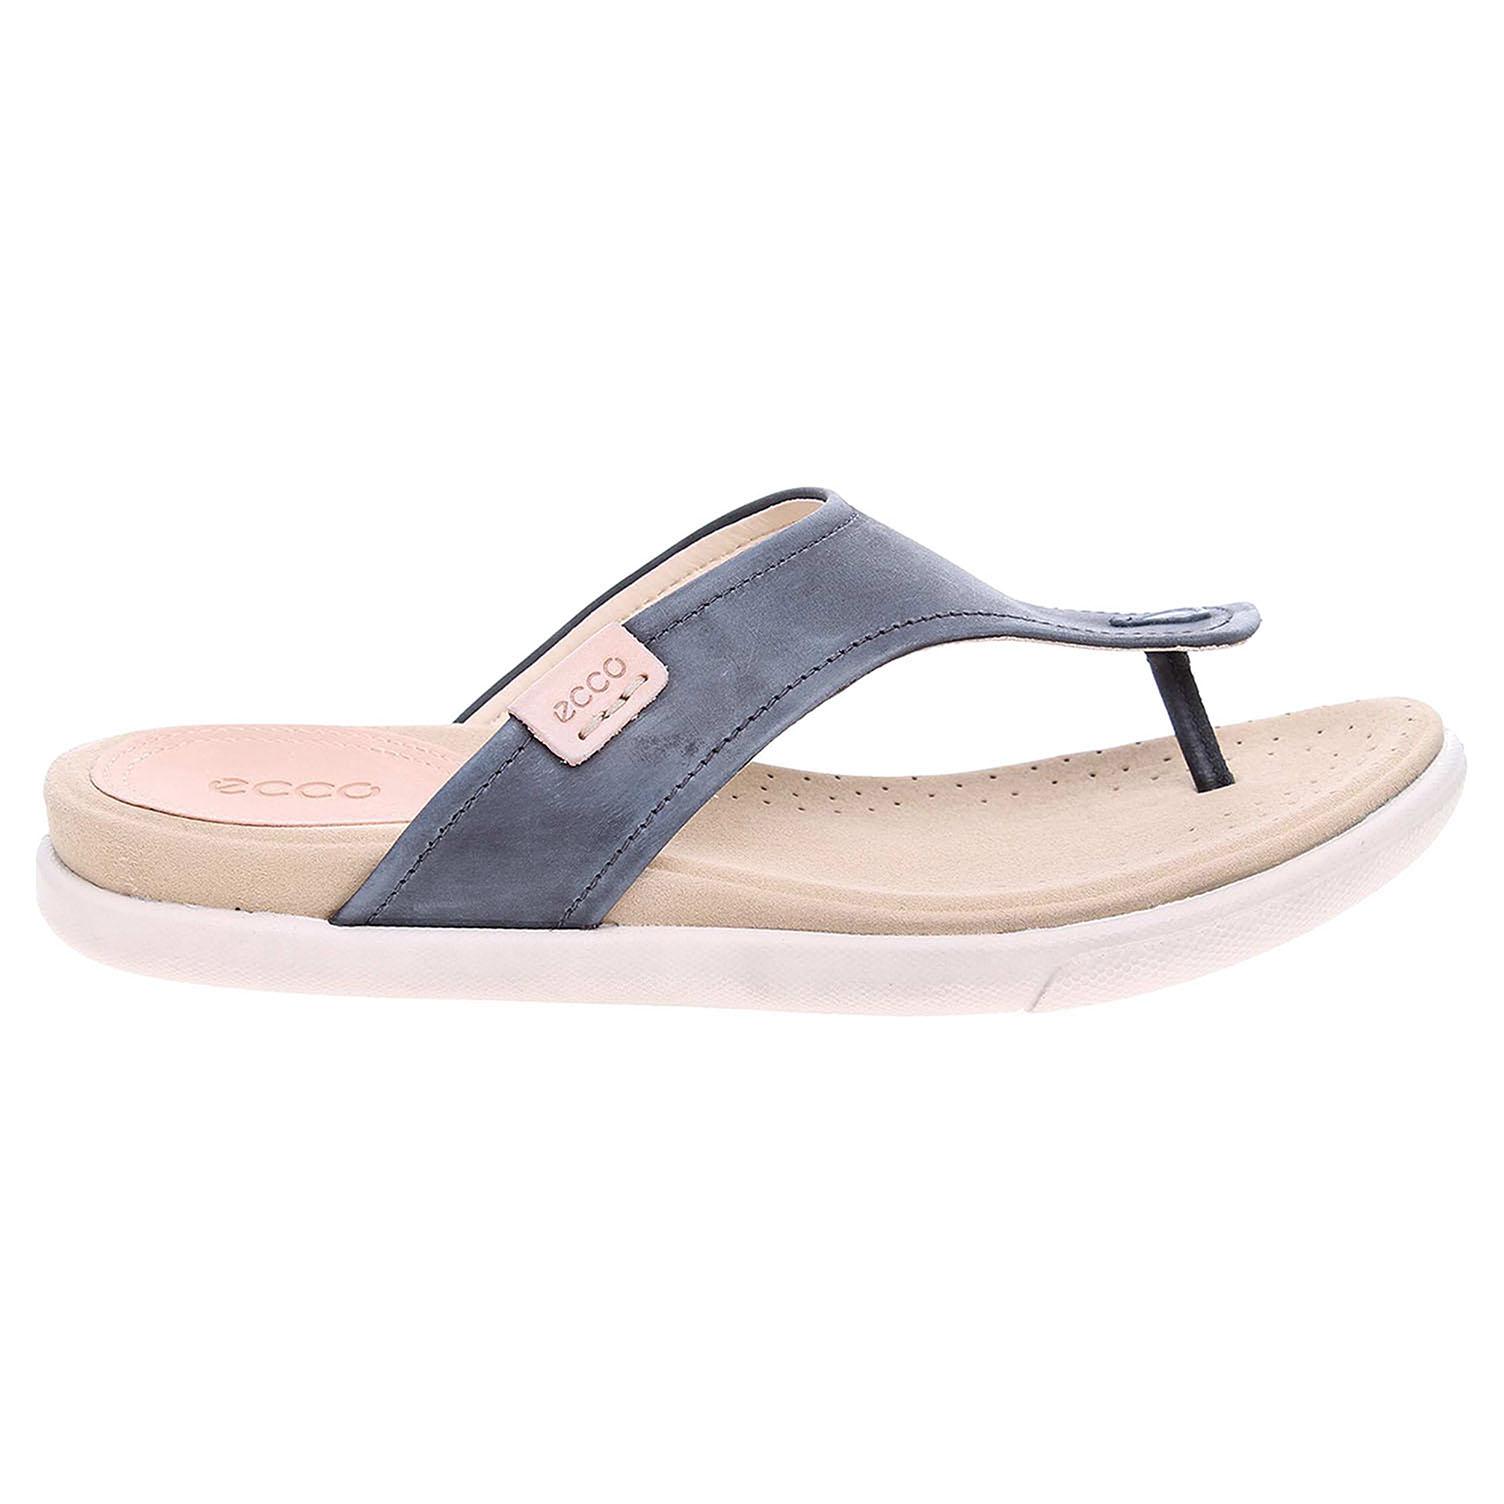 Ecco Damara dámské pantofle 24825302001 šedé 41